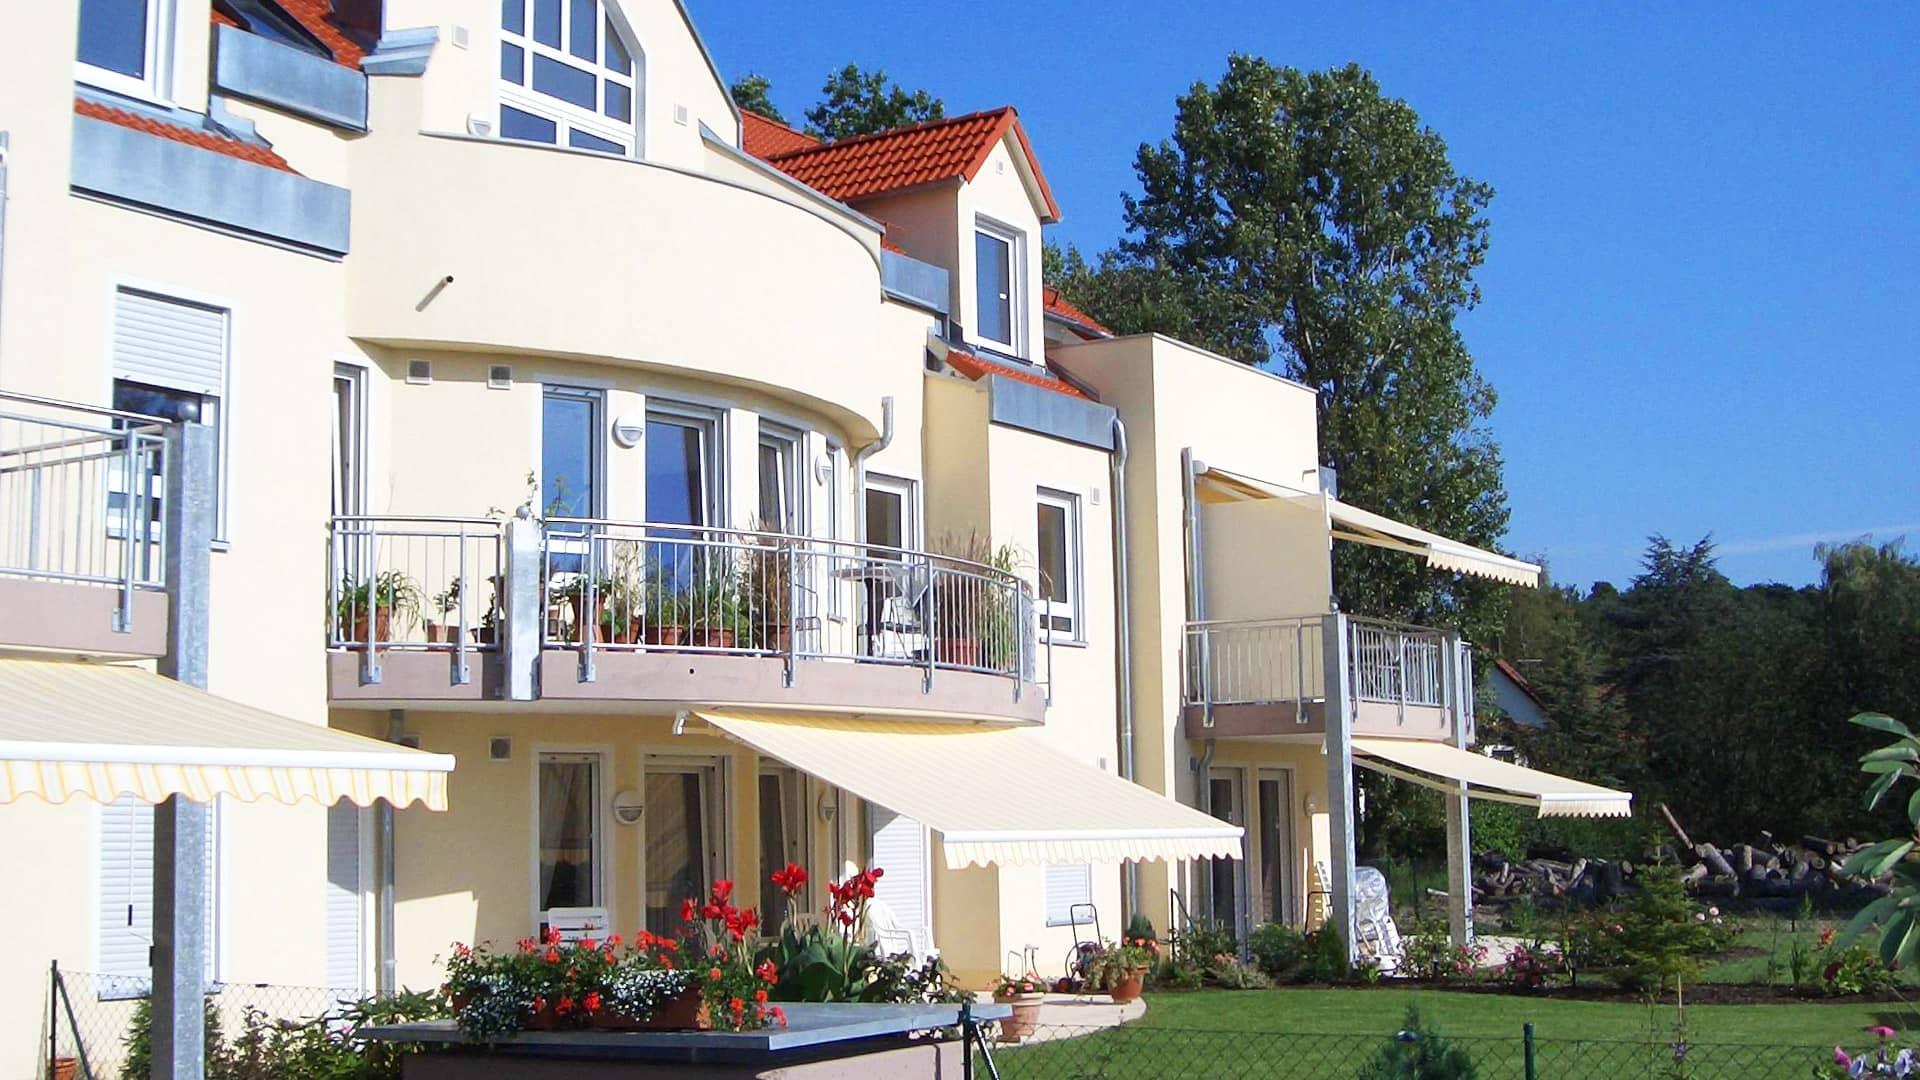 balkon good balkon alzey bausatz with balkon perfect balkon with balkon best anbaubalkon. Black Bedroom Furniture Sets. Home Design Ideas